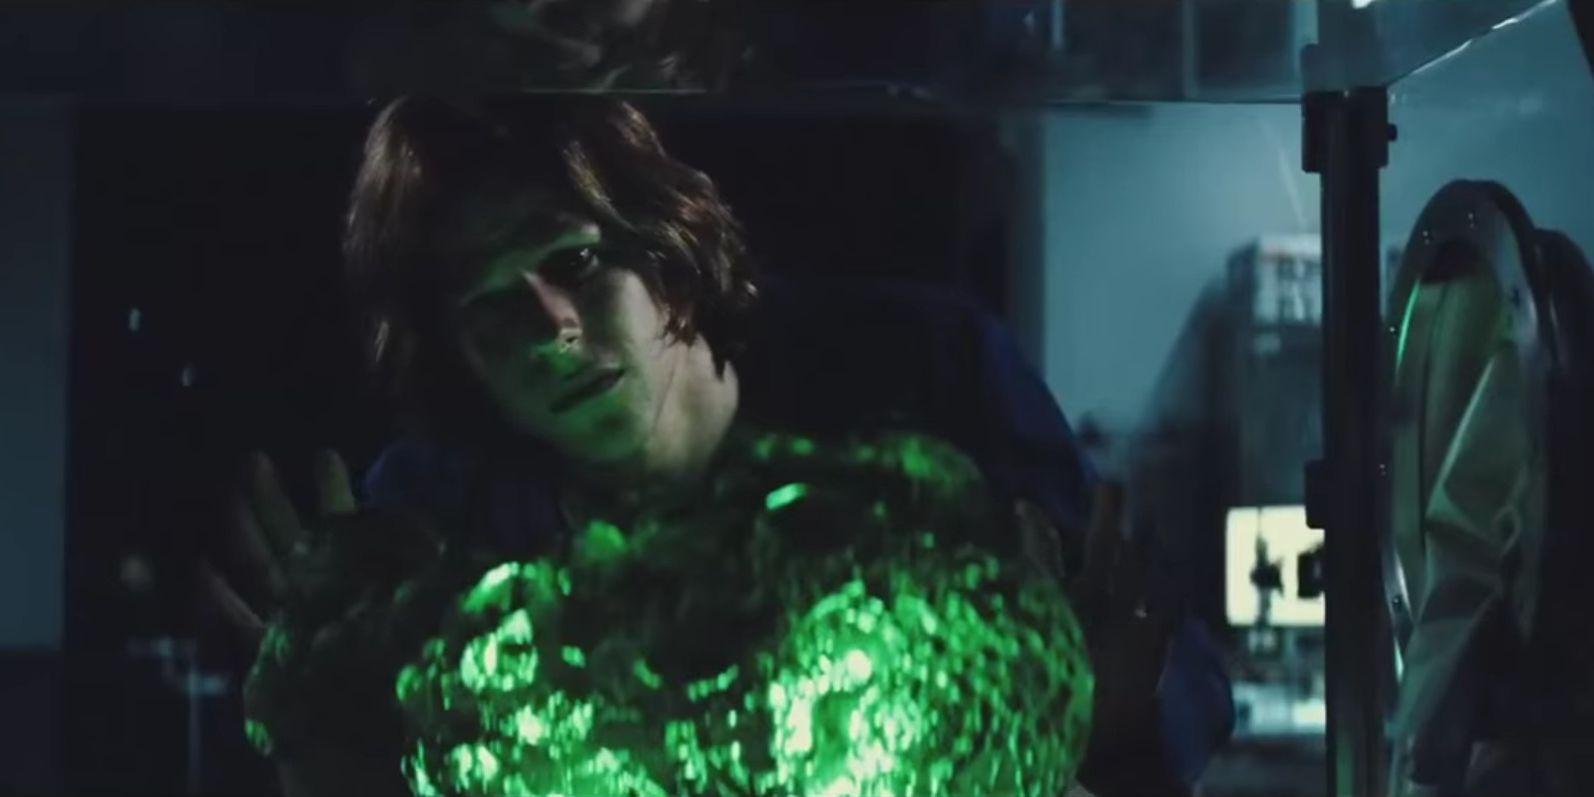 Jesse Eisenberg as Lex Luthor with Kryptonite in Batman v Superman: Dawn of Justice